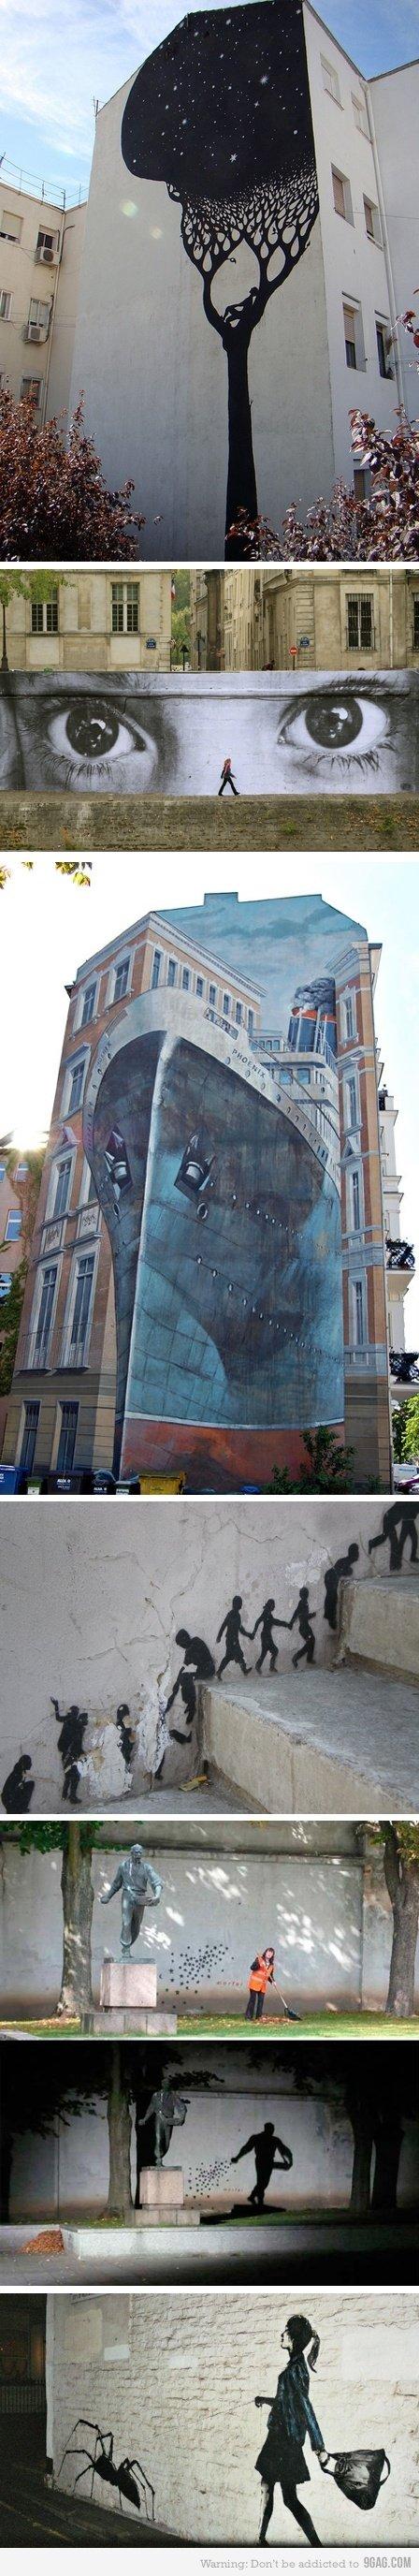 cool street art comp. . cool street art comp